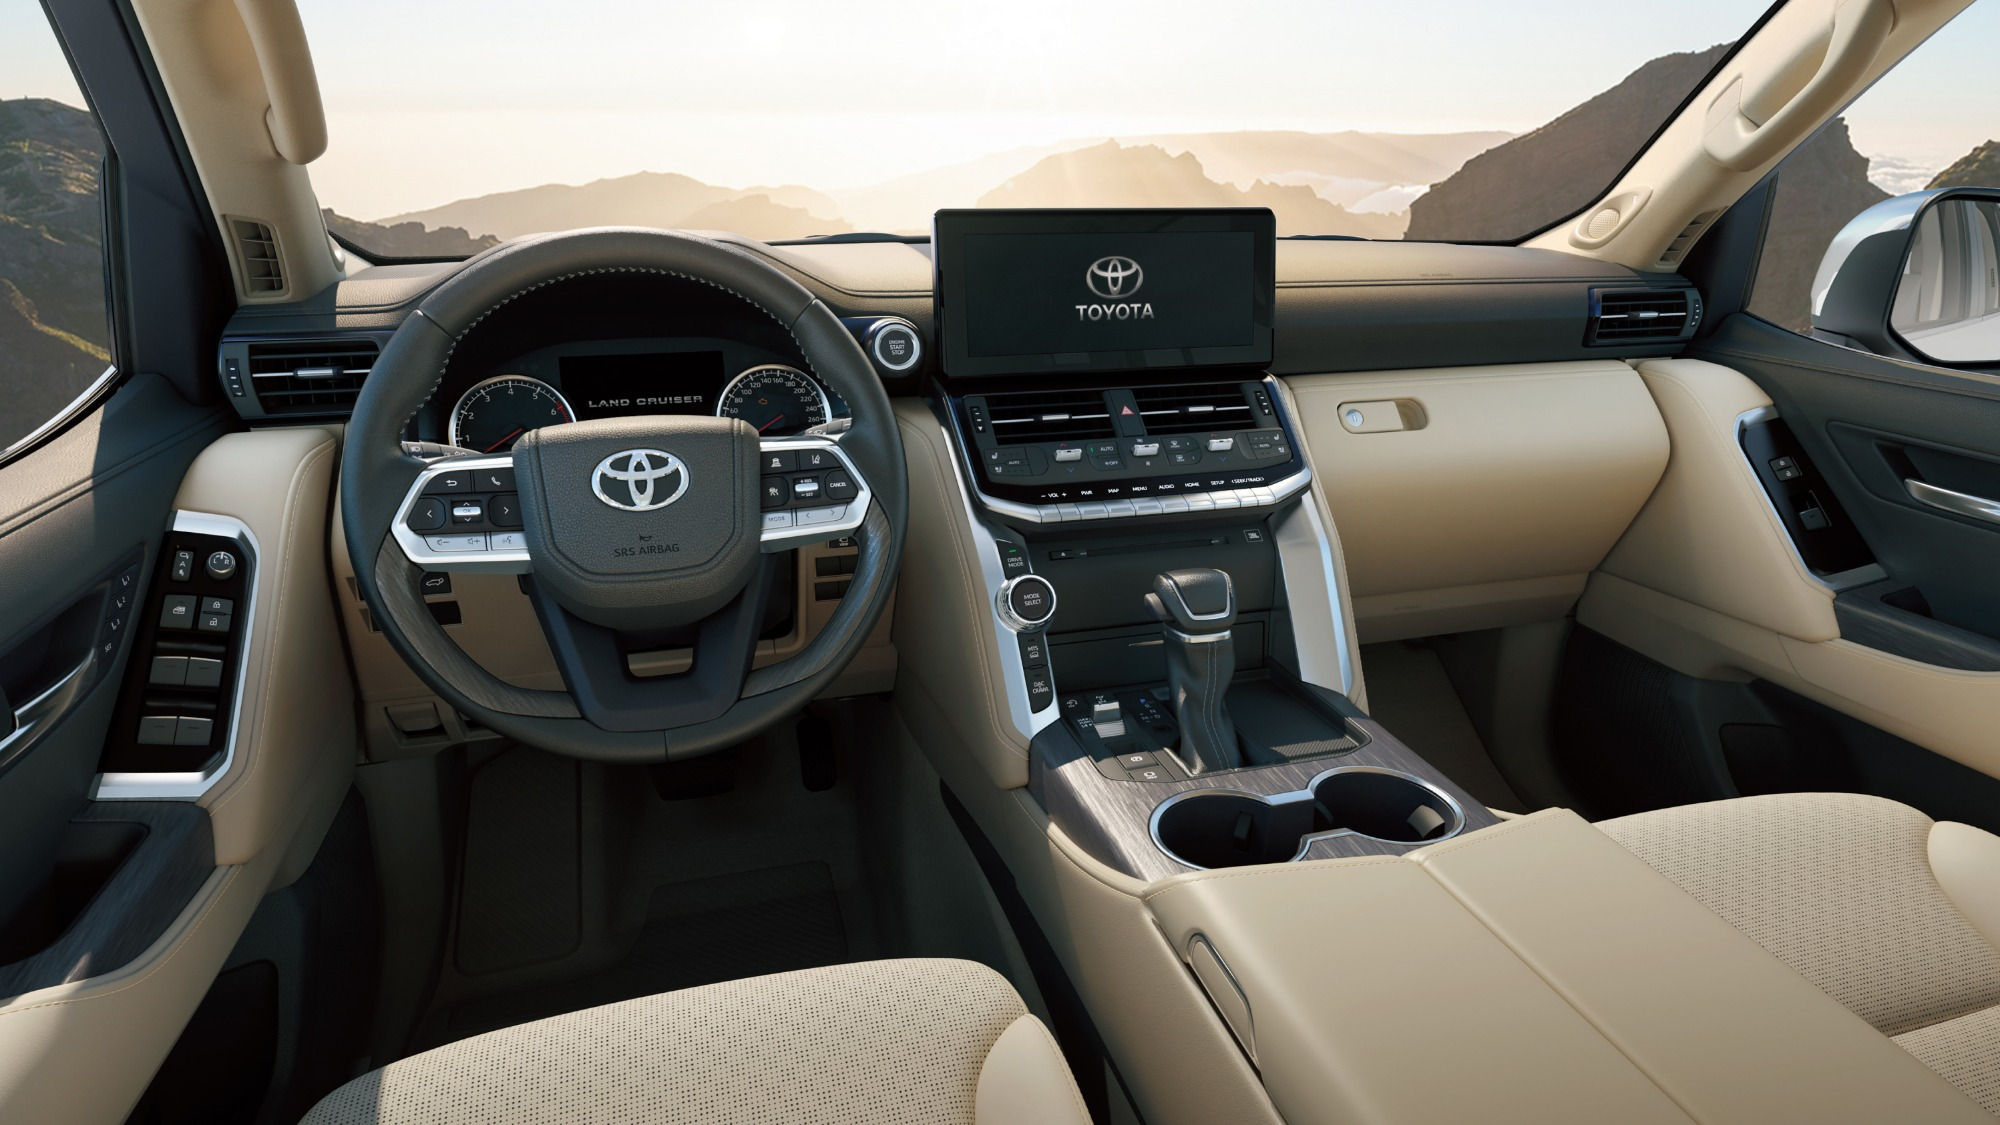 Interior do Toyota Land Cruiser 300Series visto dos bancos da frente